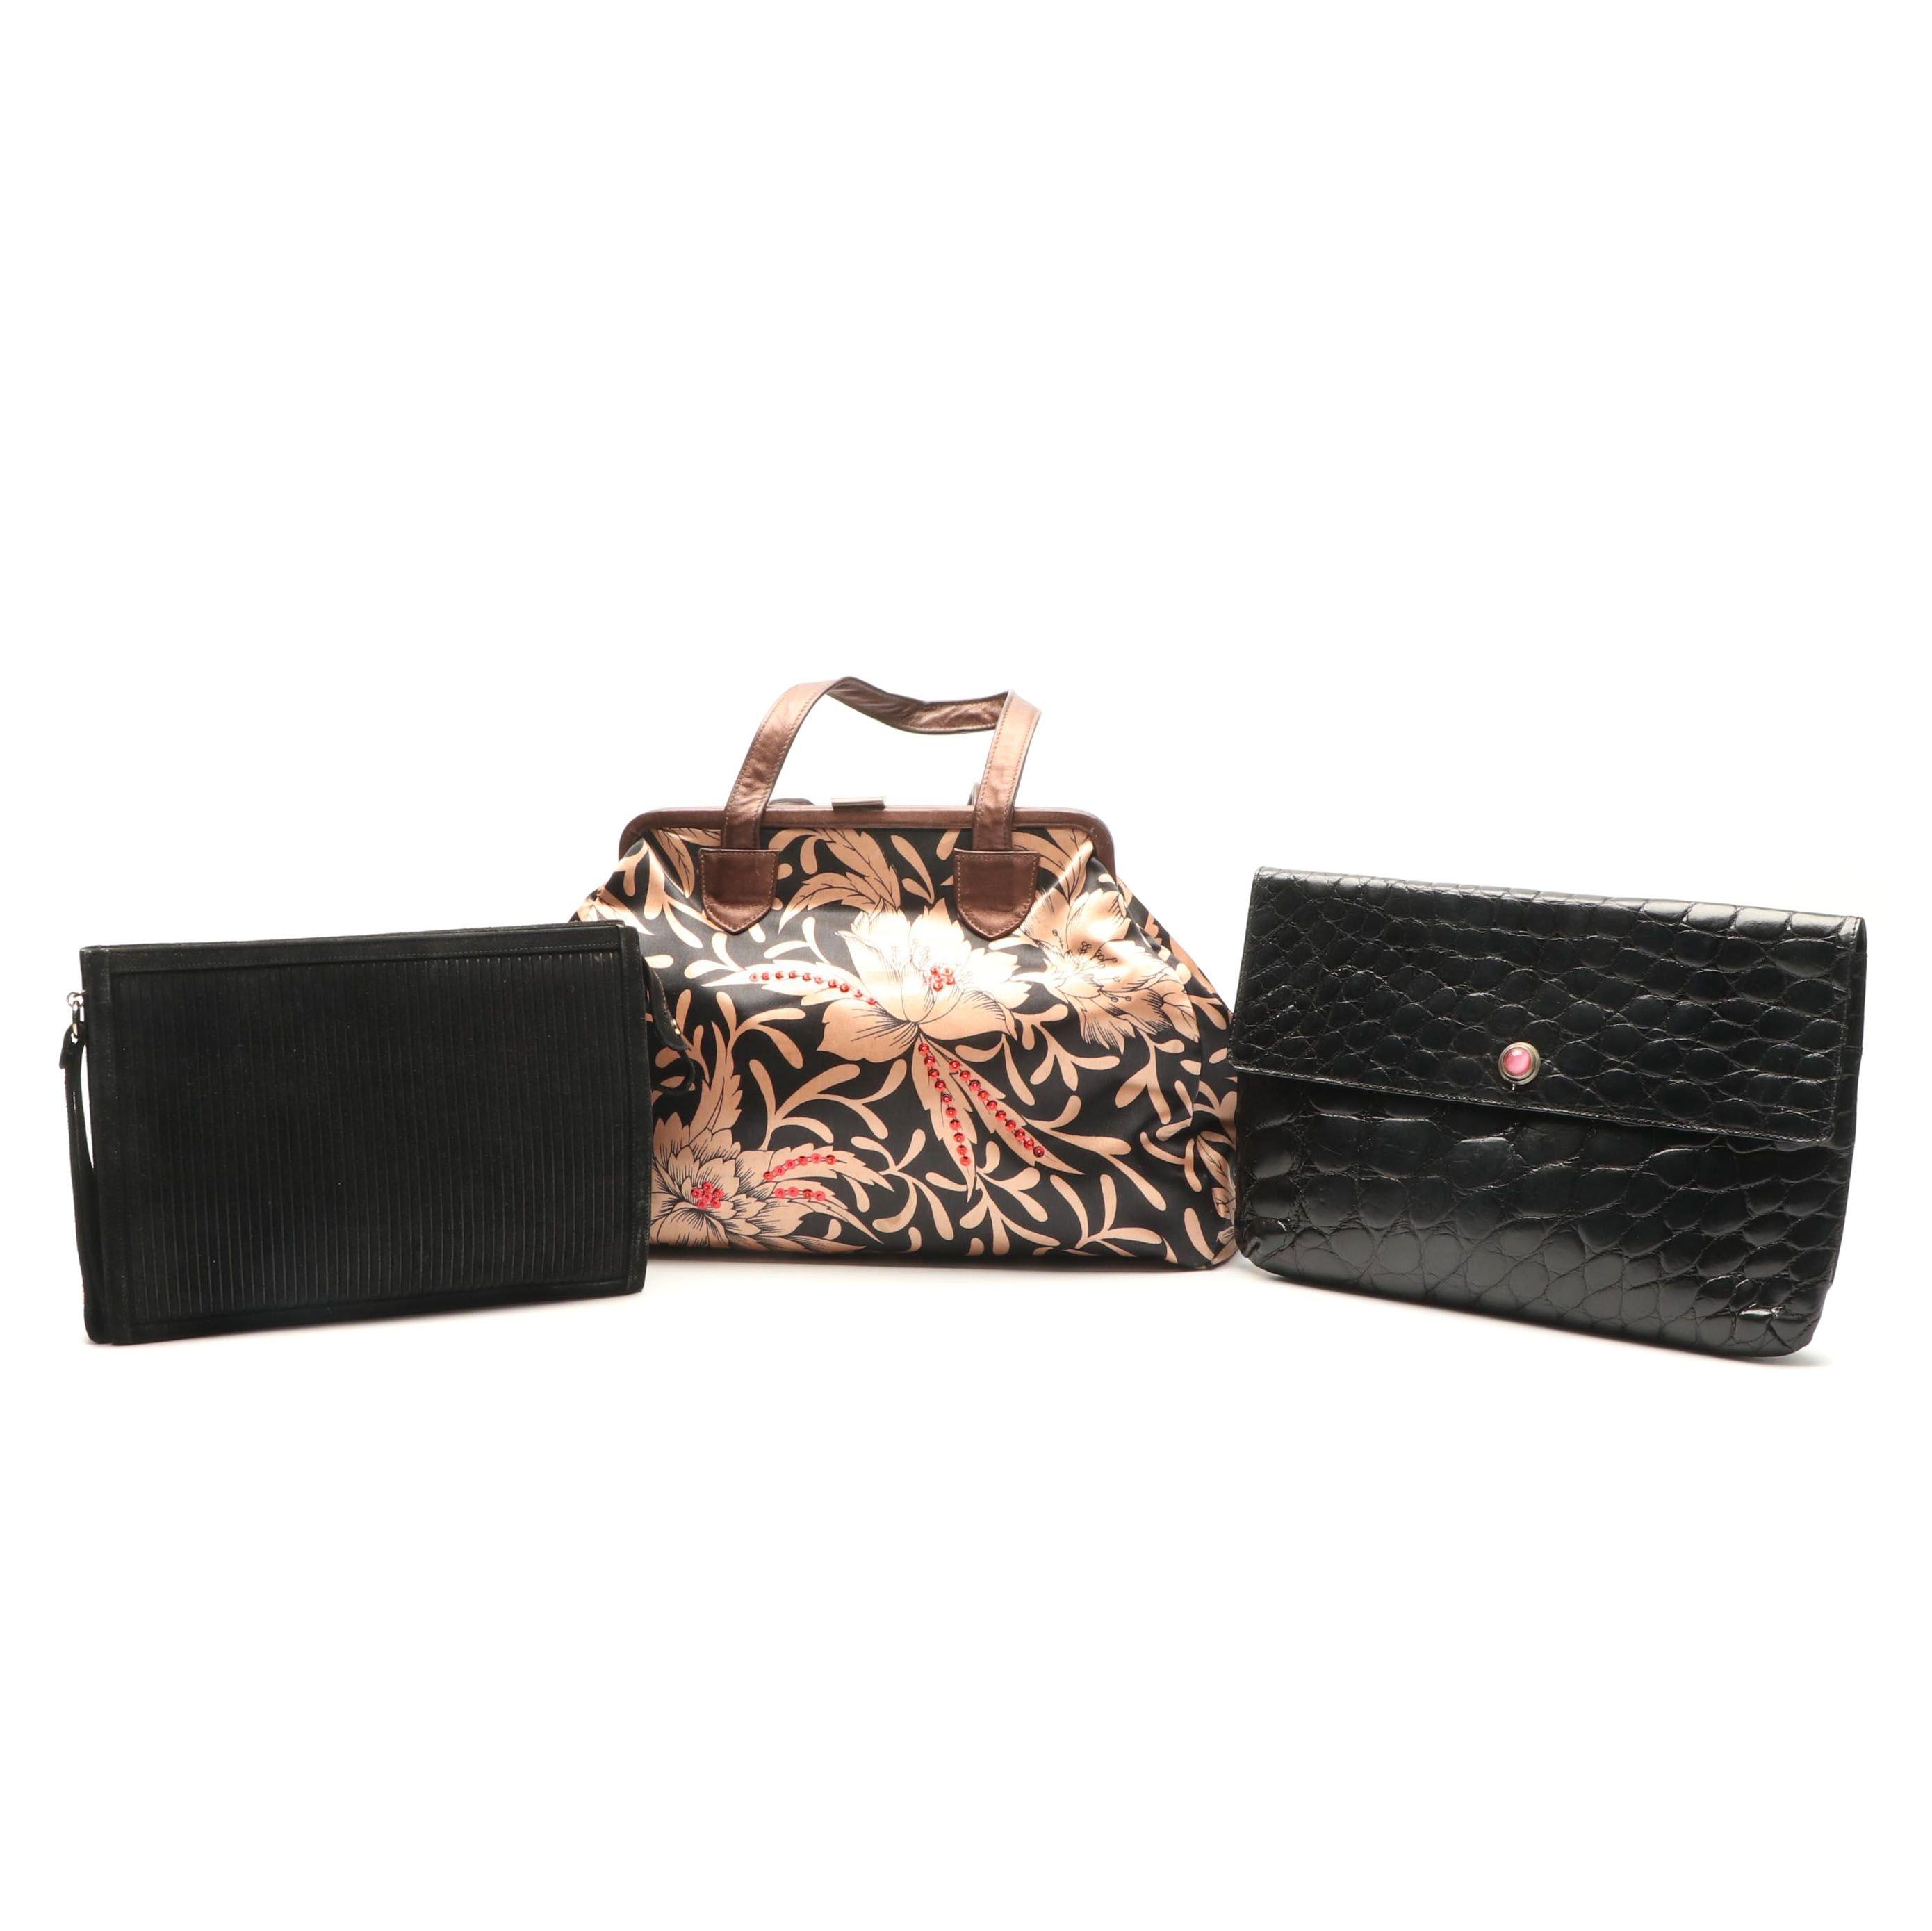 Handbags Including Jay Herbert New York and Jamie Marx Italian Envelope Clutch